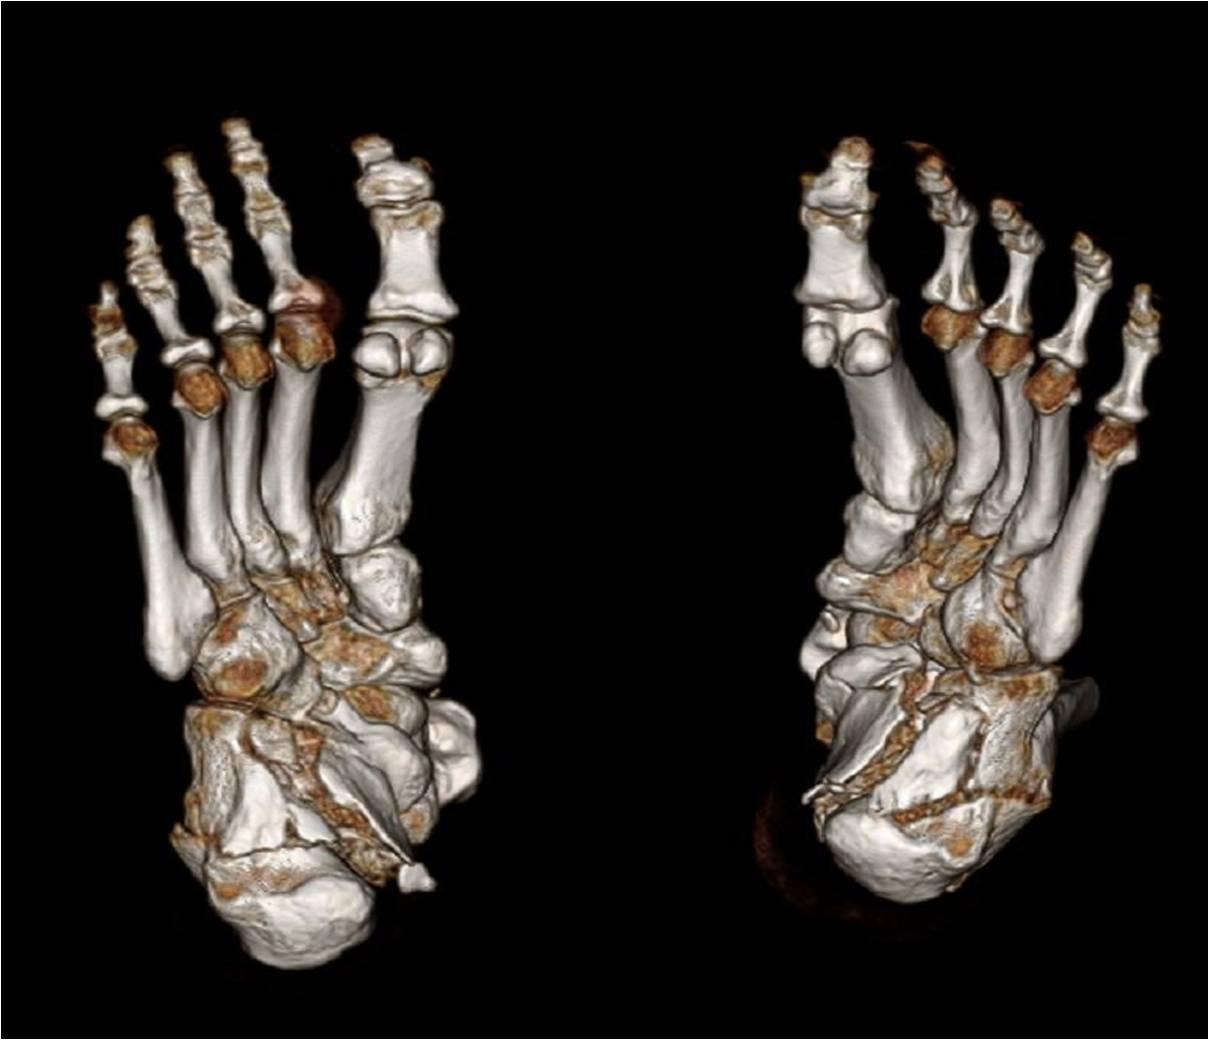 Bone CT